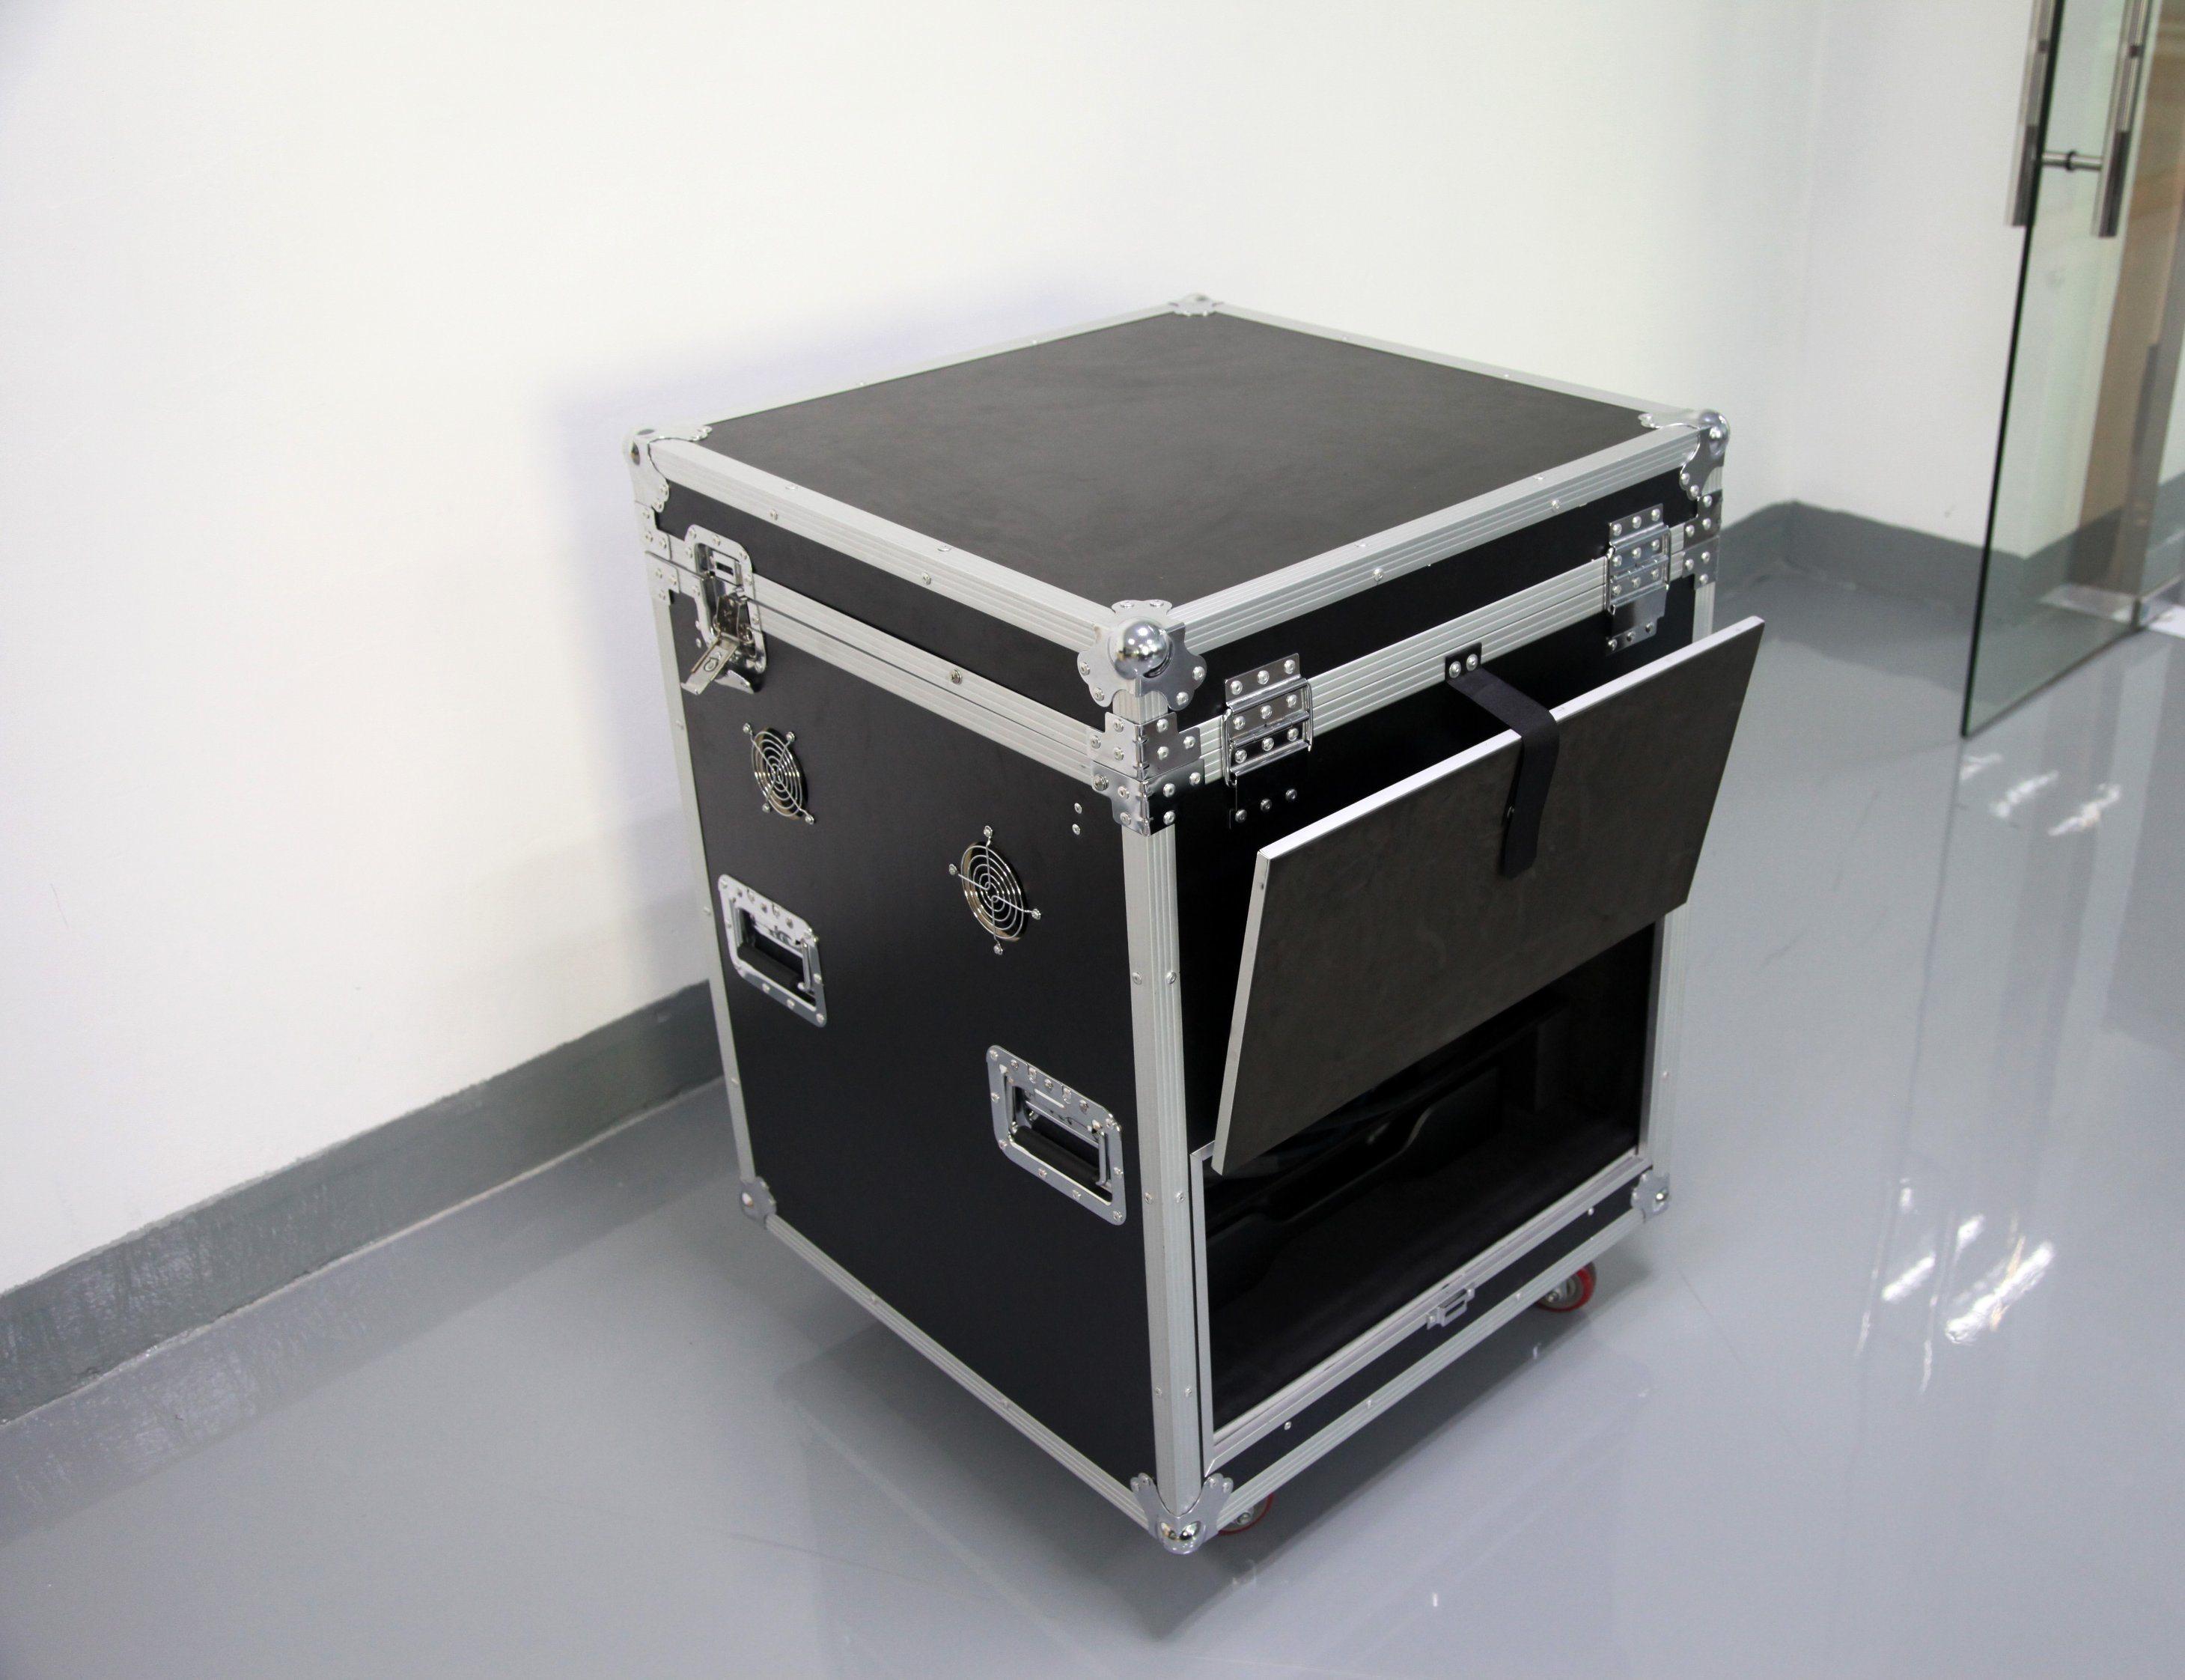 Portable Under Vehicle Surveillance System